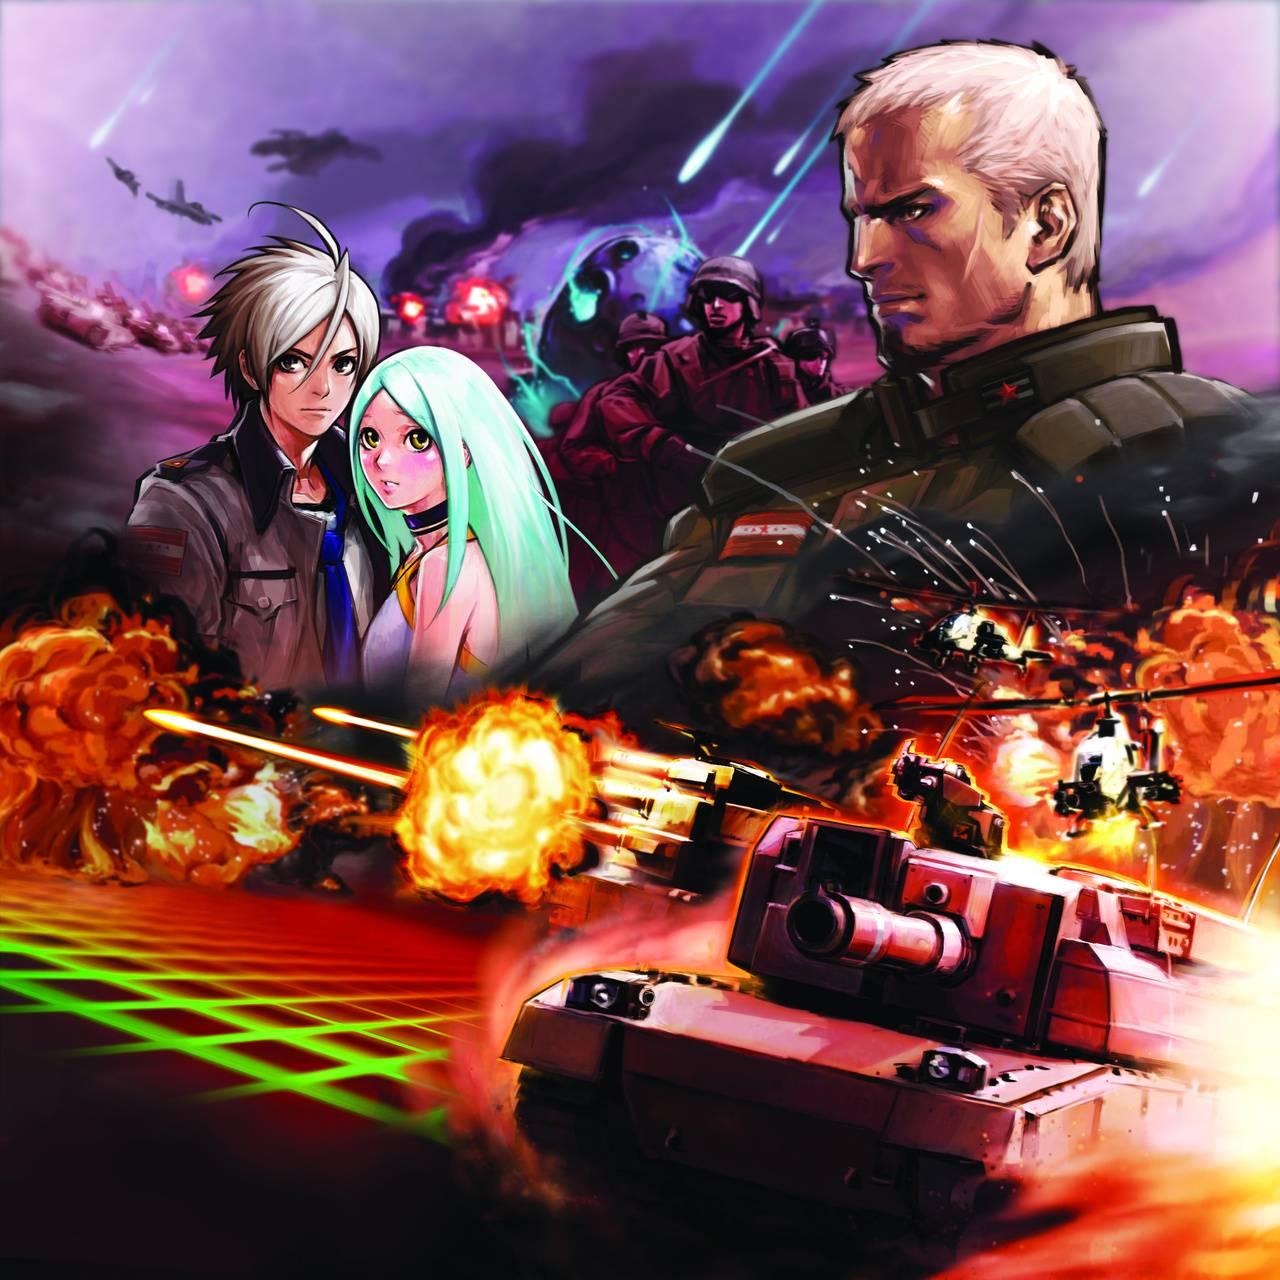 Advance Wars Dor Wallpaper By Gabe98 21 Free On Zedge